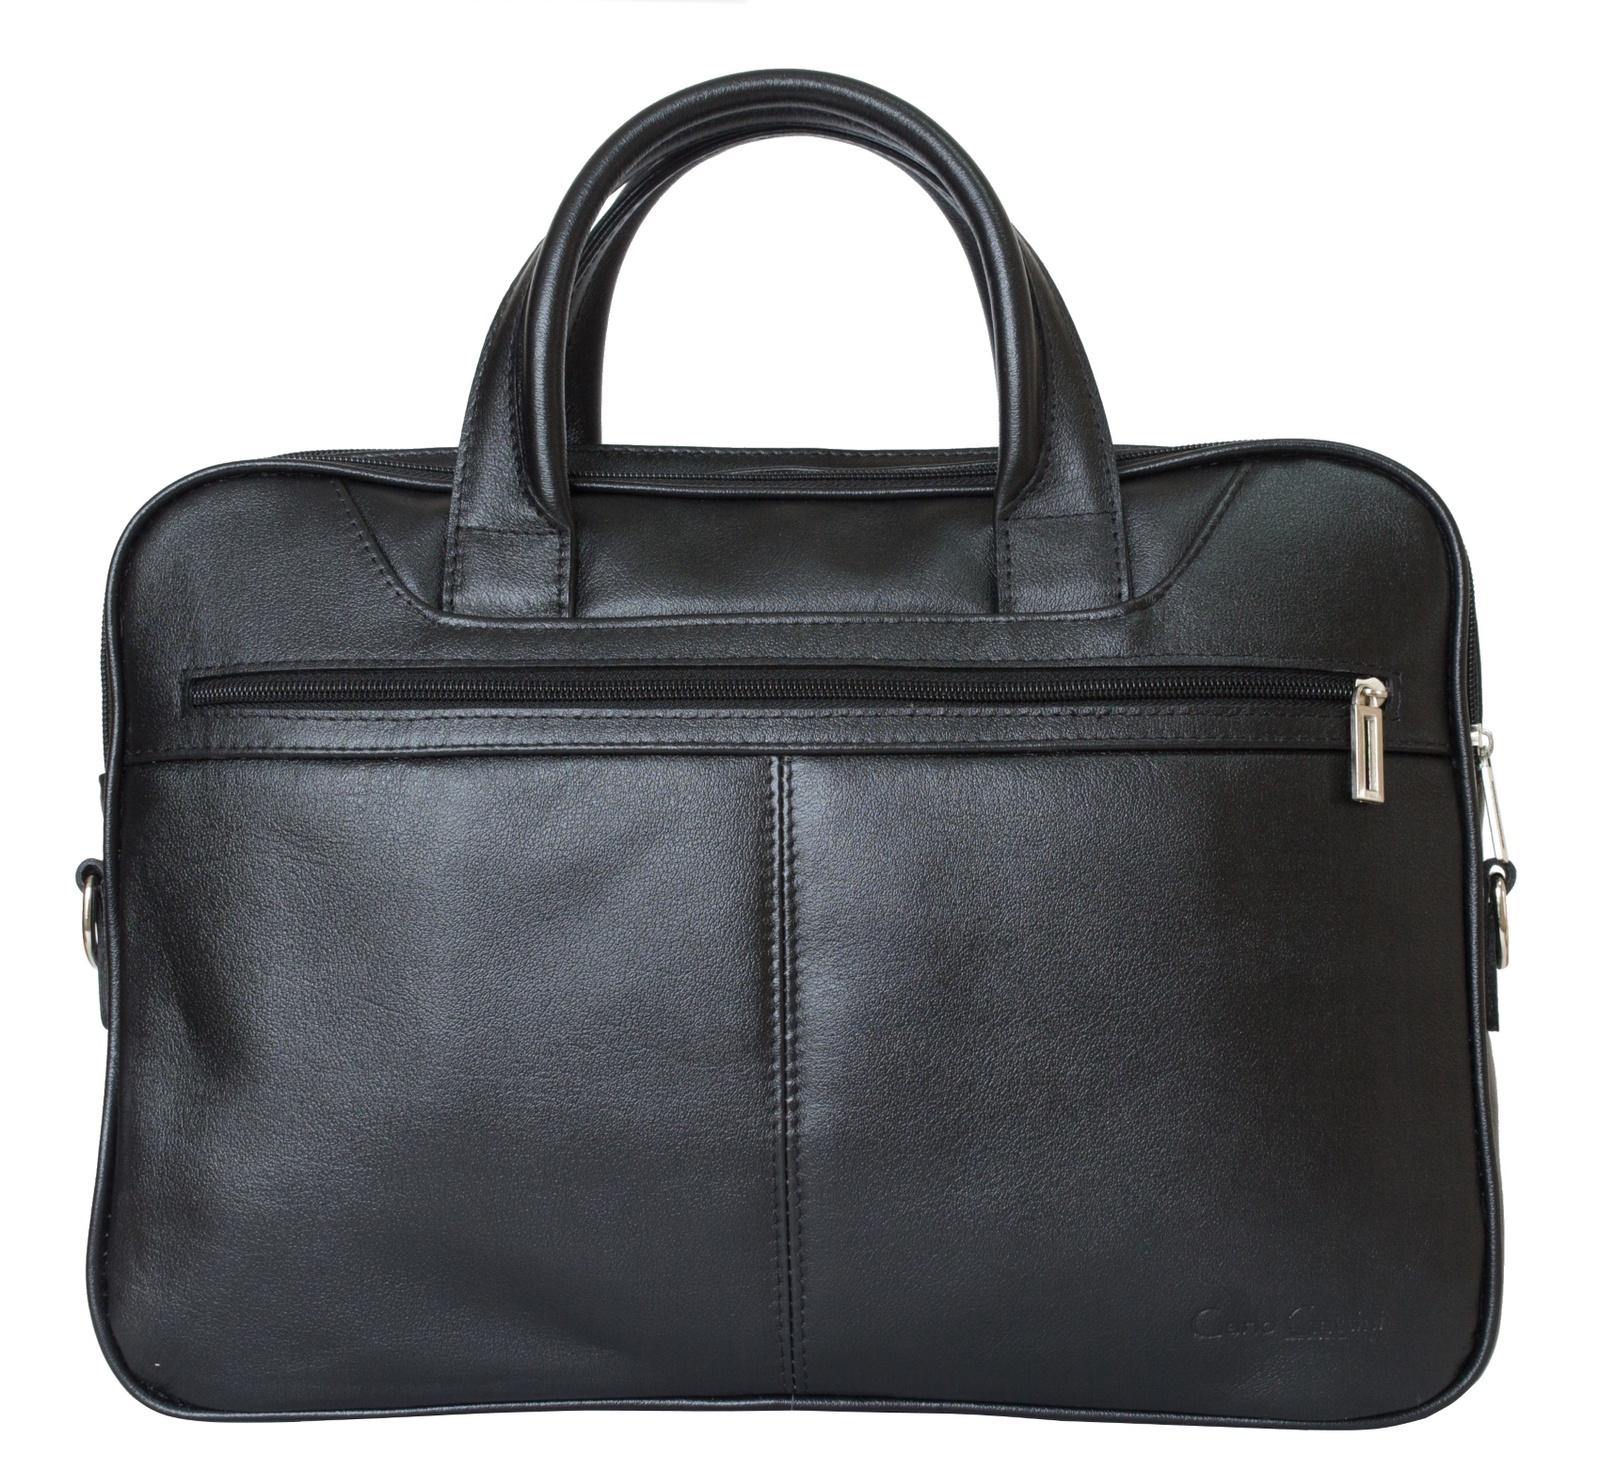 Сумка для ноутбука Carlo Gattini сумка для ноутбука carlo gattini сумка для ноутбука 1008 01